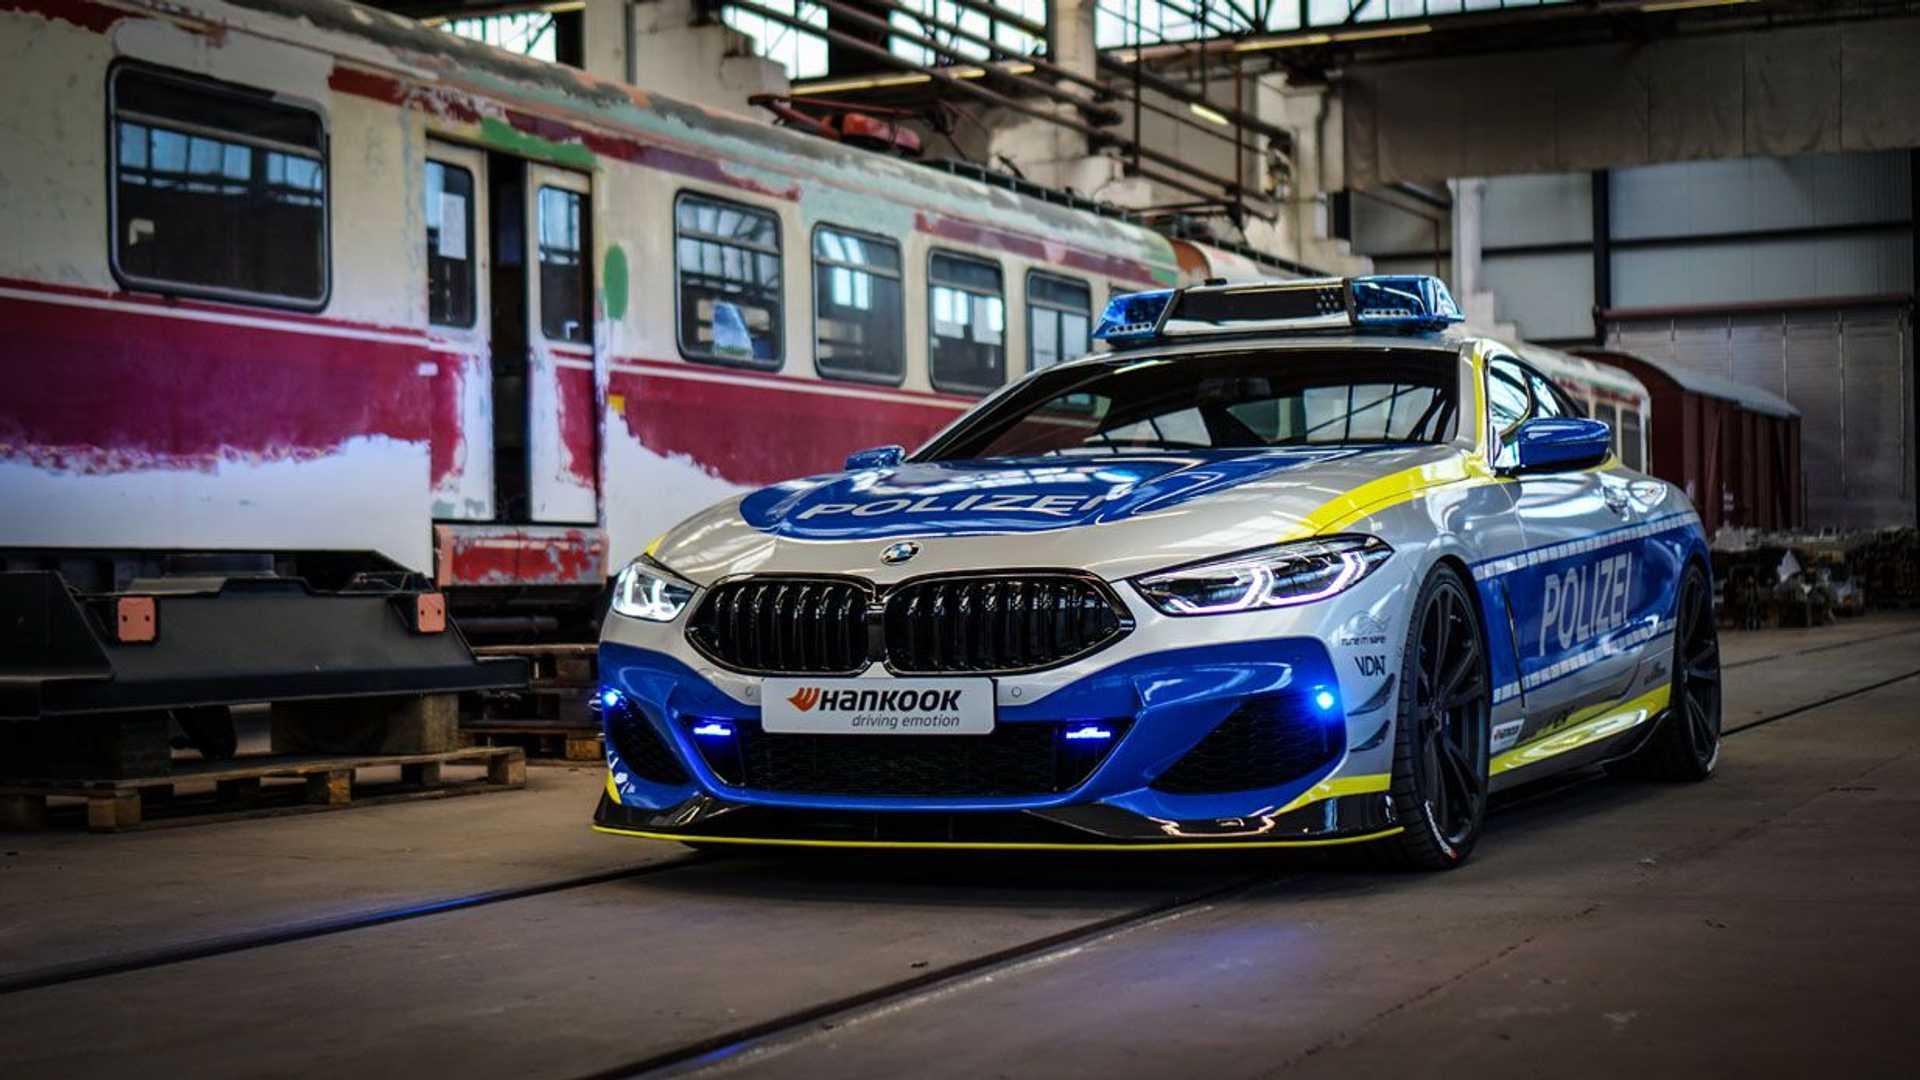 BMW-M850i-police-car-tune-it-safe-6